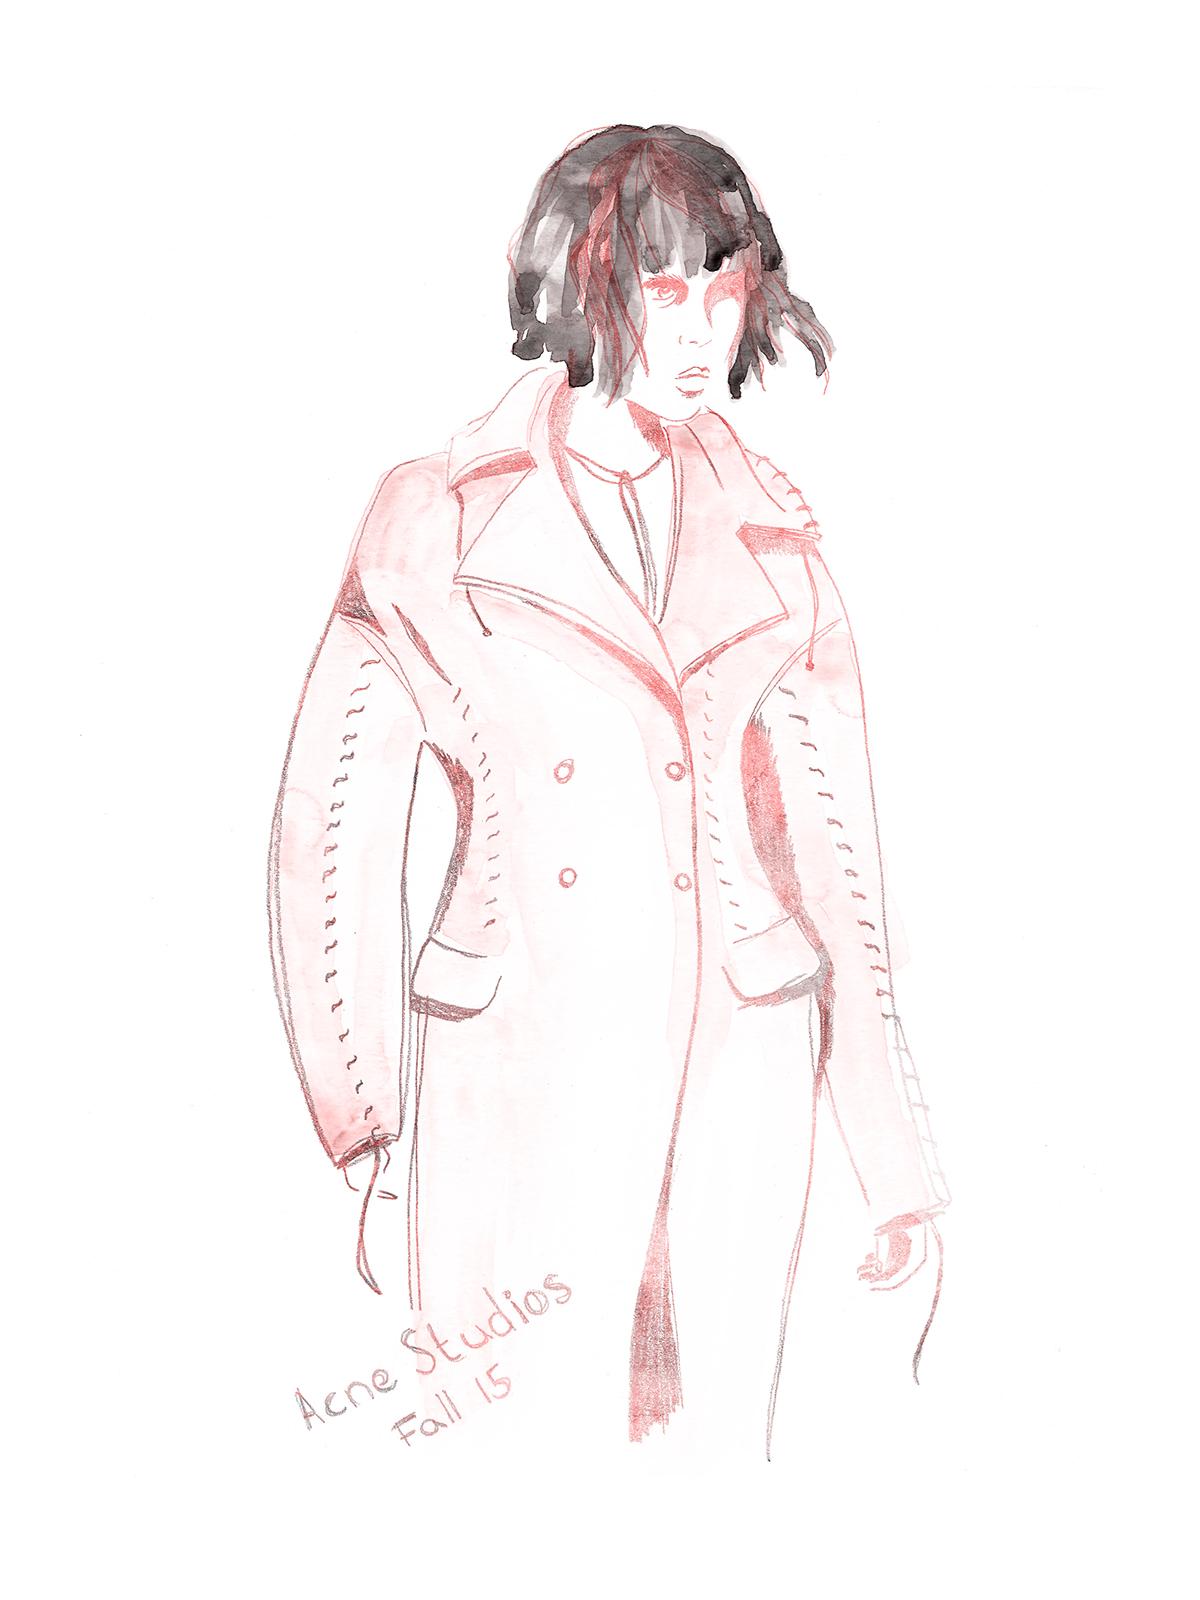 Fashion ,ILLUSTRATION ,hand drawing,watercolor,pencil,runway,Acne Studios,Dries Van Noten,sketching,editorial